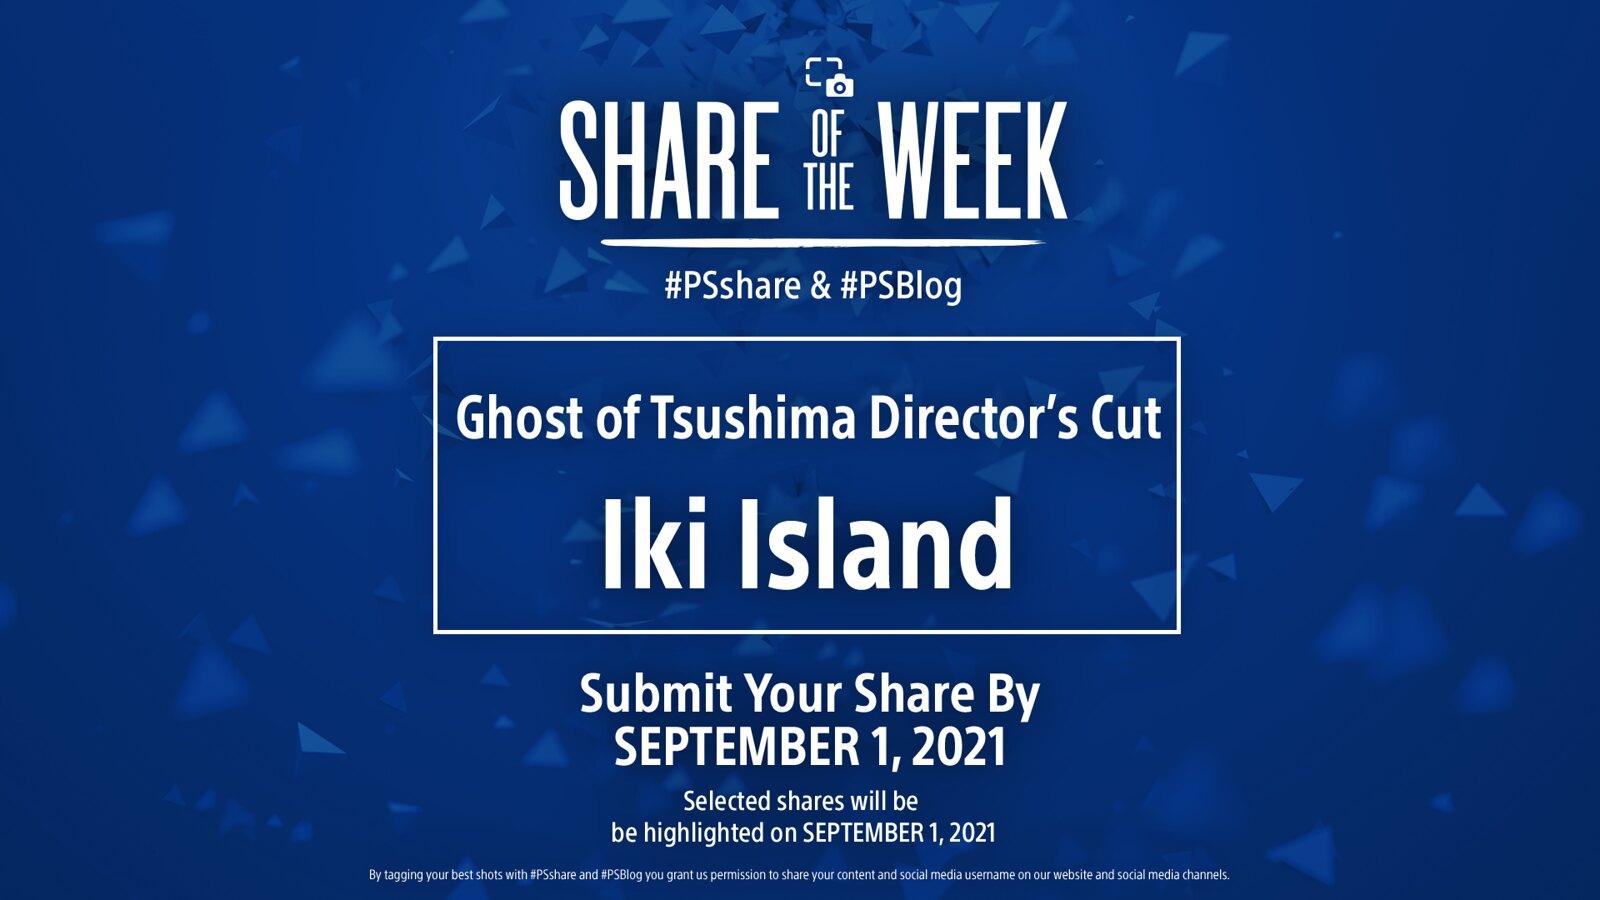 51405598660 f5a3fbfc02 h Ghost of Tsushima Director's Cut – PlayStation.Blog